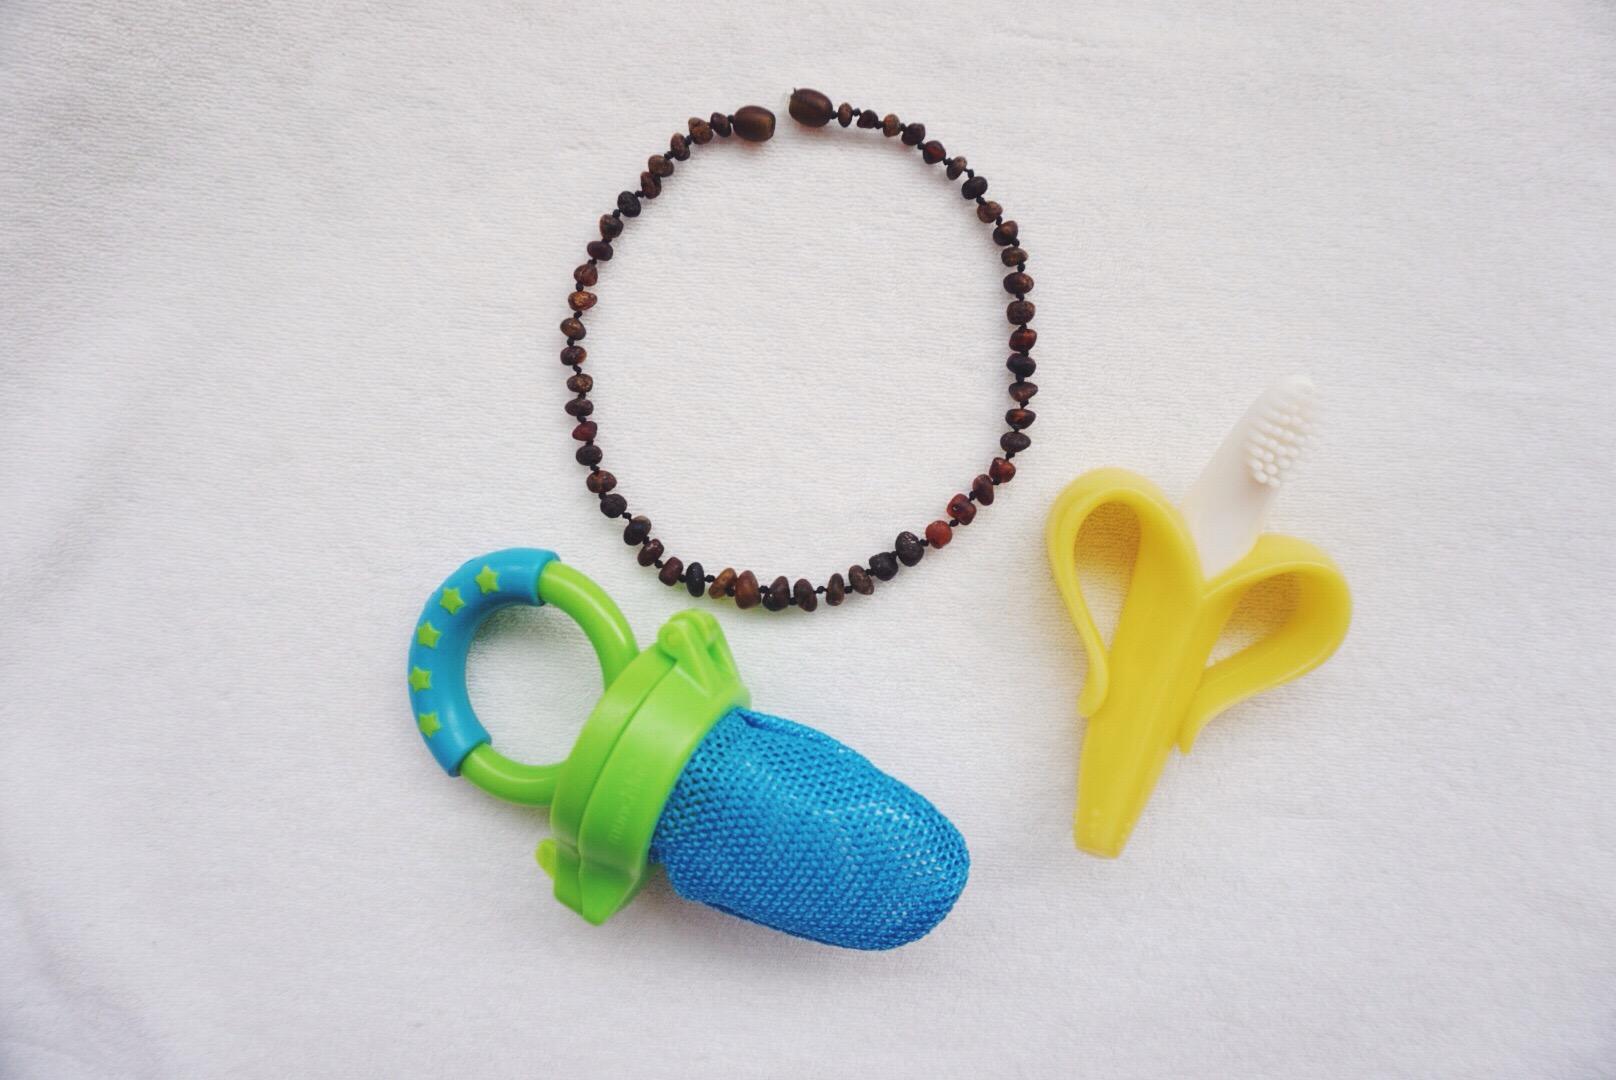 (clockwise) Amber teething necklace, Baby Banana Infant Teething Toothbrush, Munchkin Fresh Food Feeder.